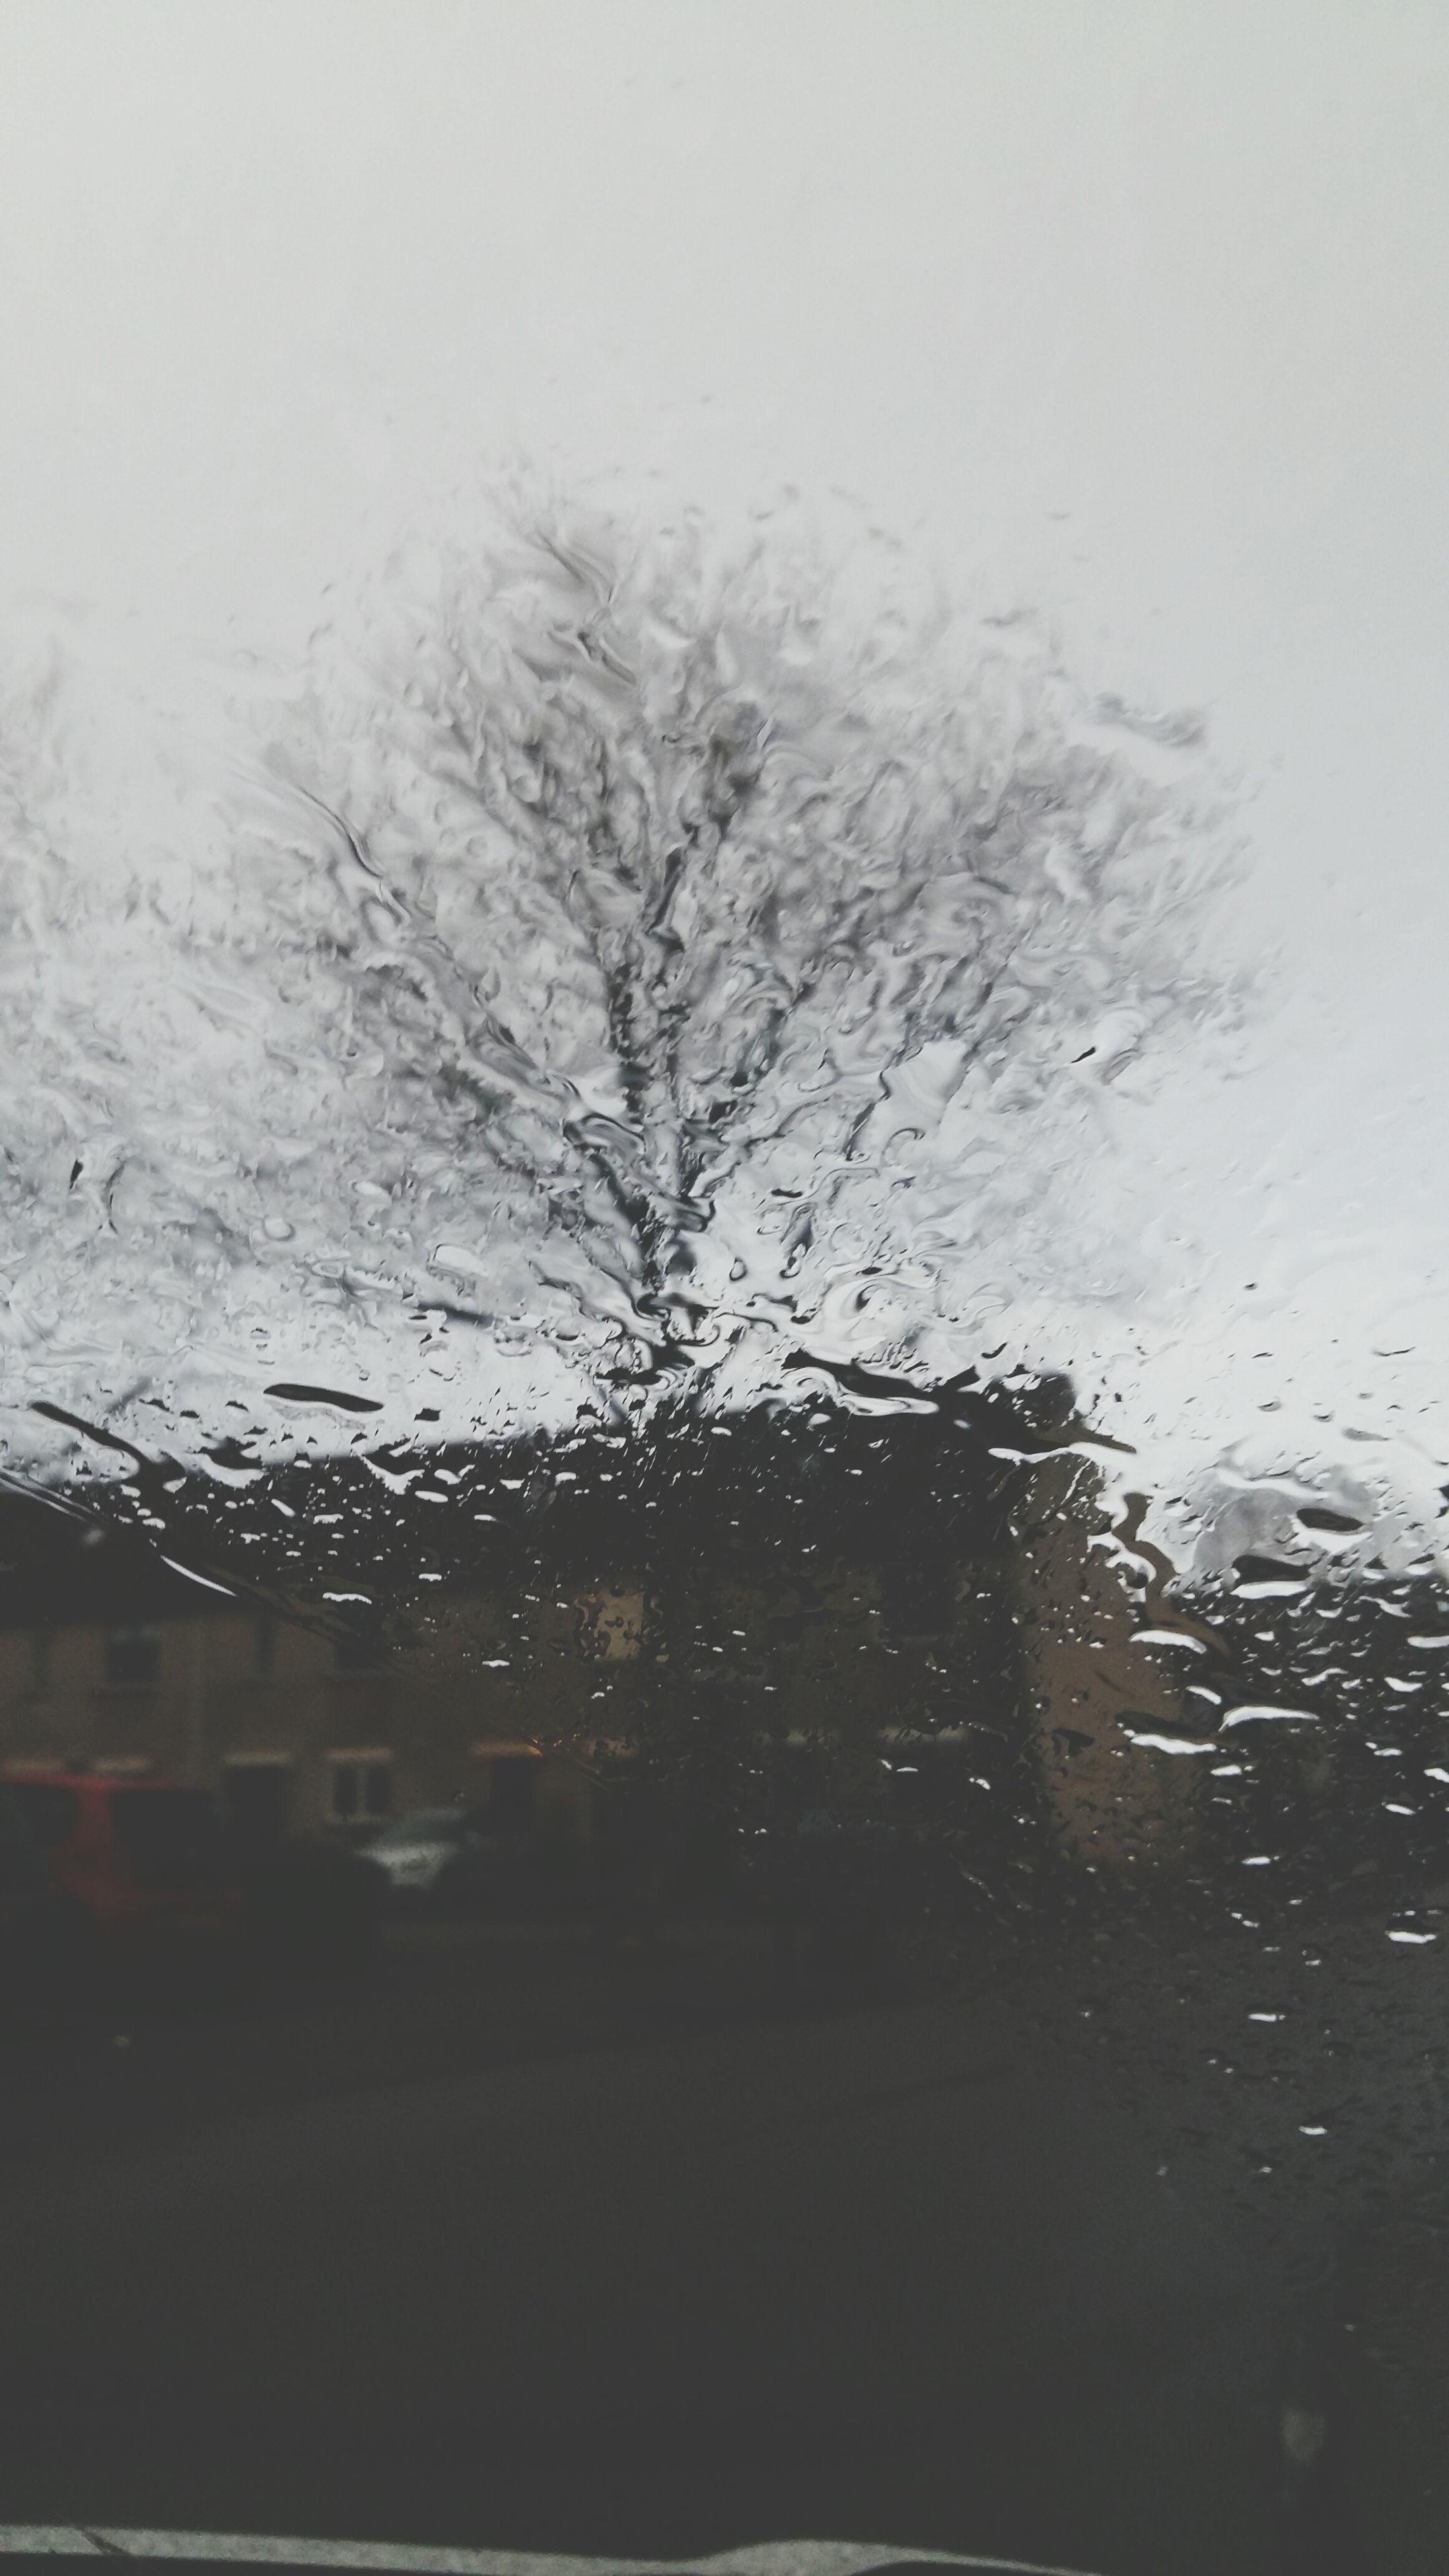 wet, drop, rain, window, transparent, glass - material, weather, season, water, car, raindrop, transportation, indoors, land vehicle, road, vehicle interior, glass, sky, mode of transport, monsoon